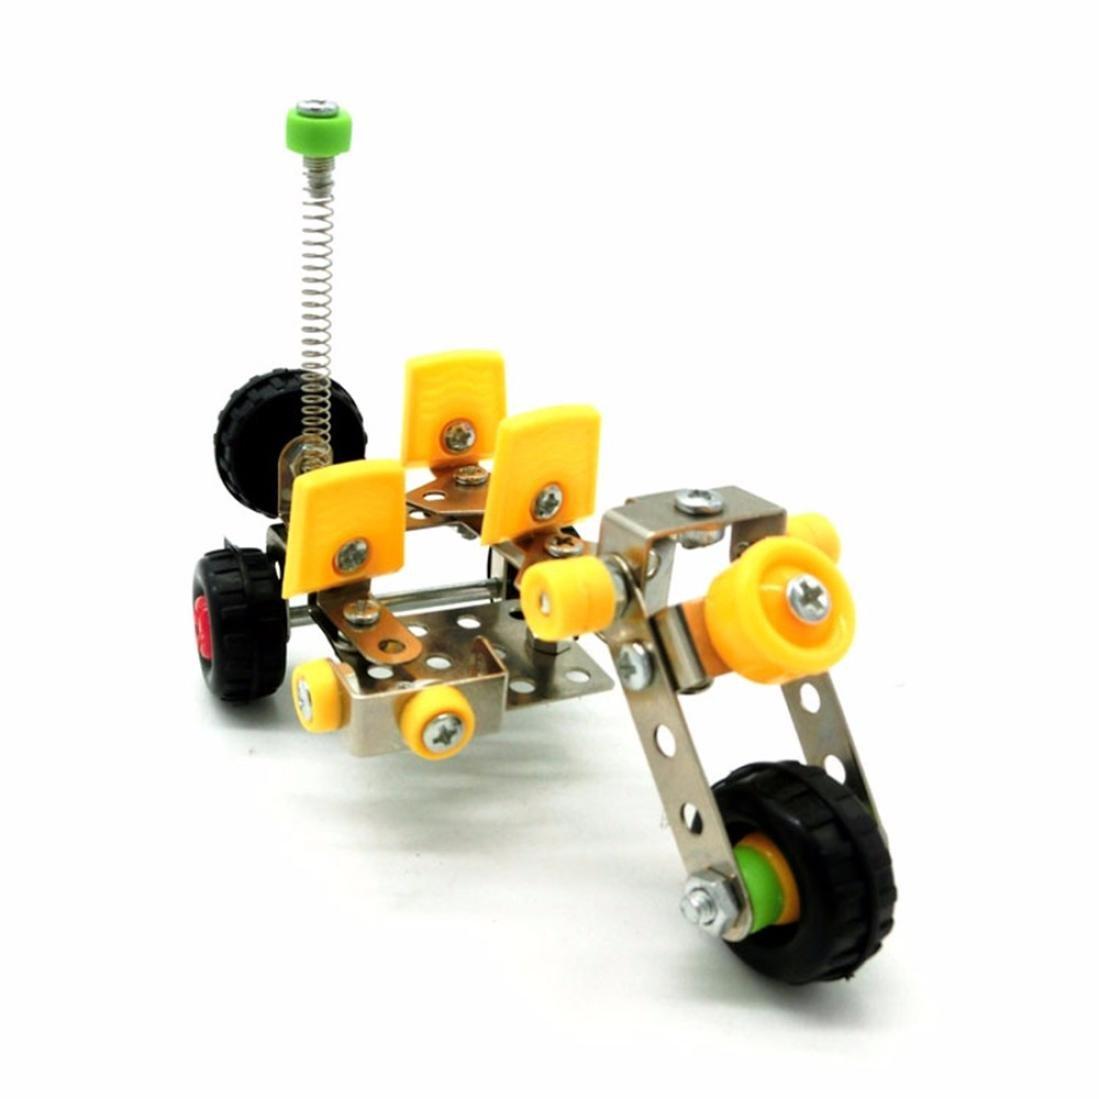 3d Solid Metal Assembly Blocks Toy,Mamum DIY 3D Three Dimensional Metal Jigsaw Puzzle Assembling Block Engineering Nut D